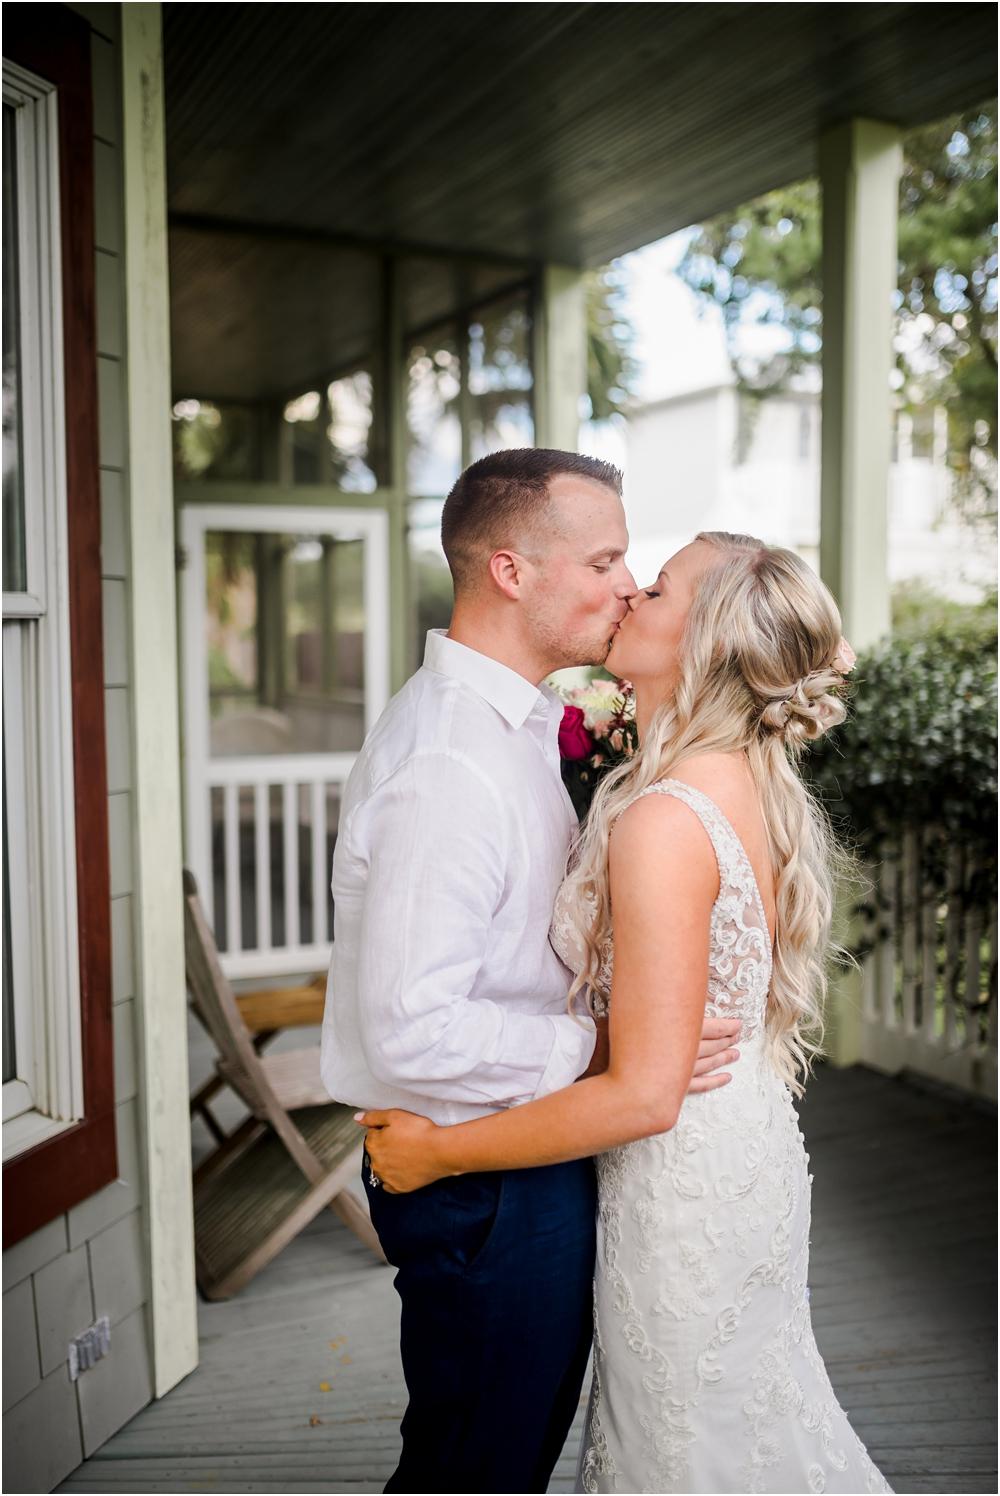 mcglothlin-wedding-kiersten-stevenson-photography-30a-panama-city-beach-dothan-tallahassee-(49-of-145).jpg